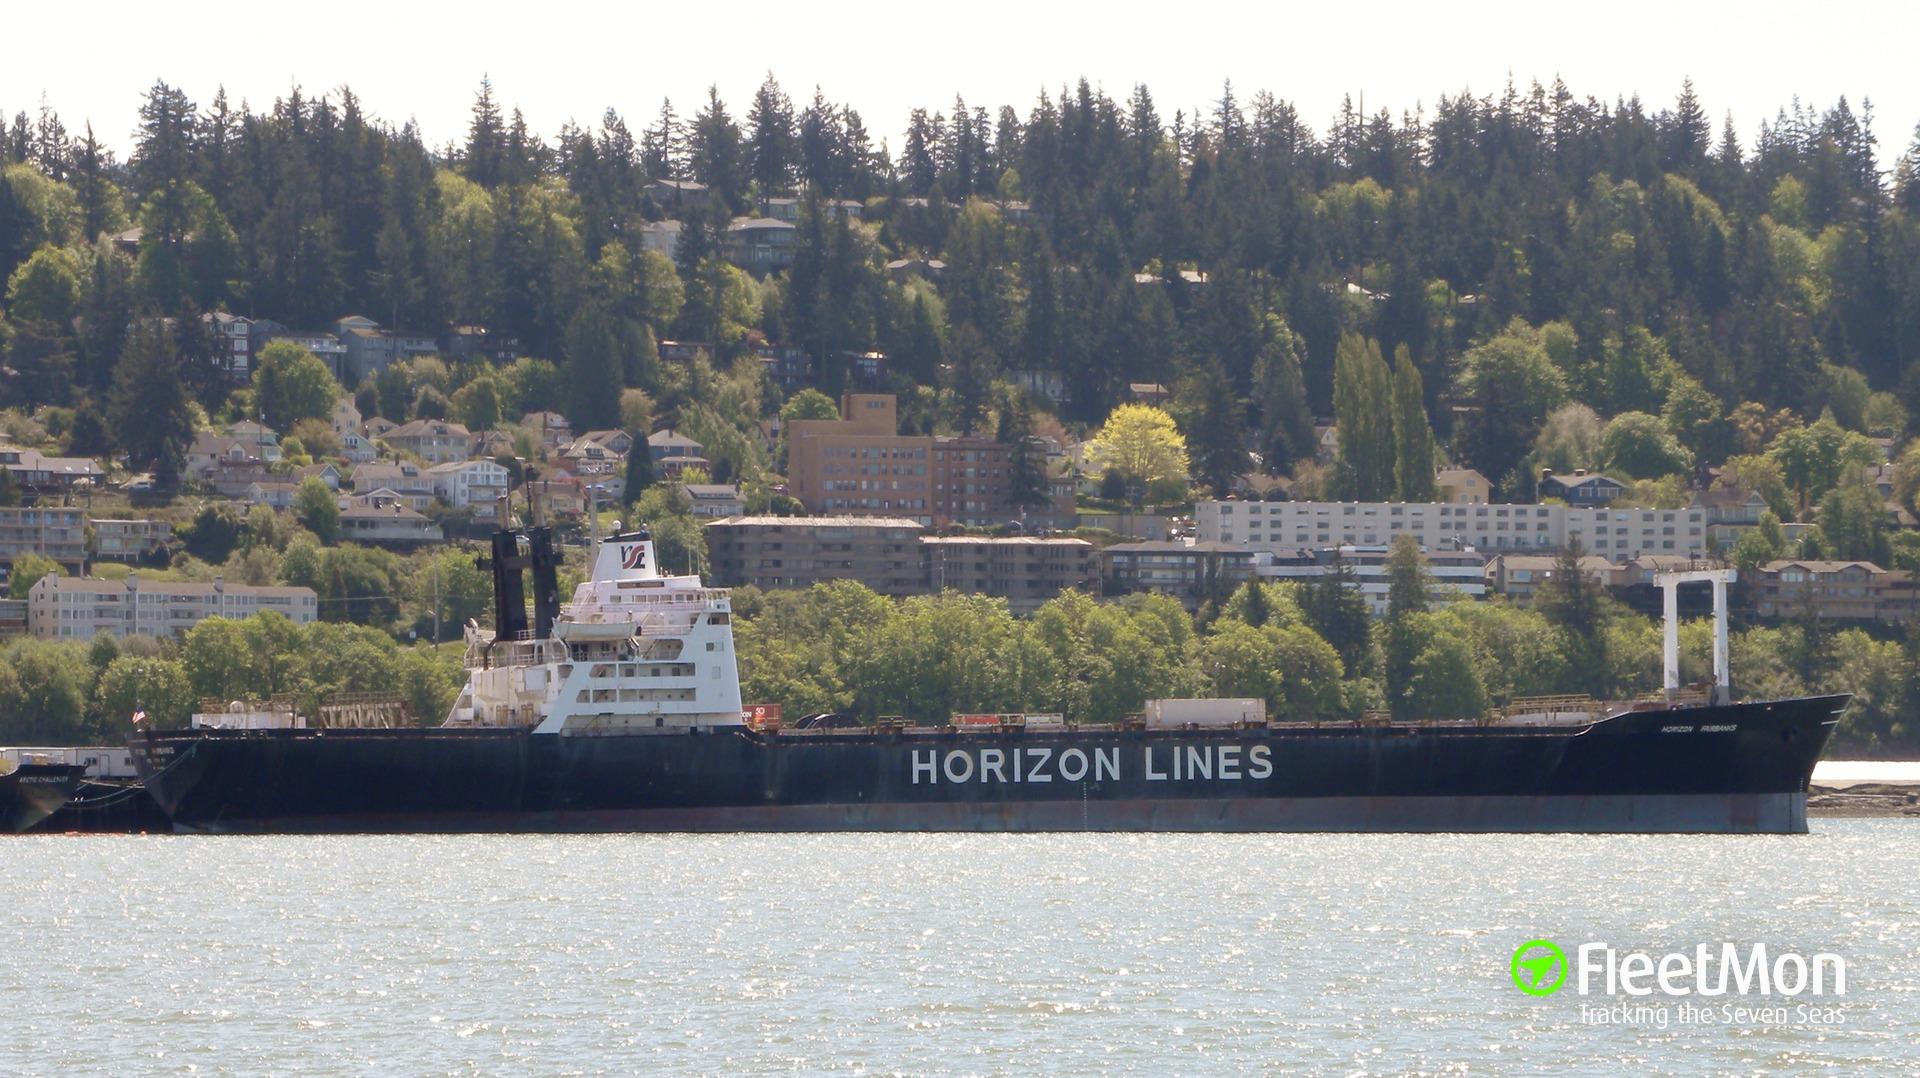 Container ship Horizon Fairbanks accident, Bellingham, Washington